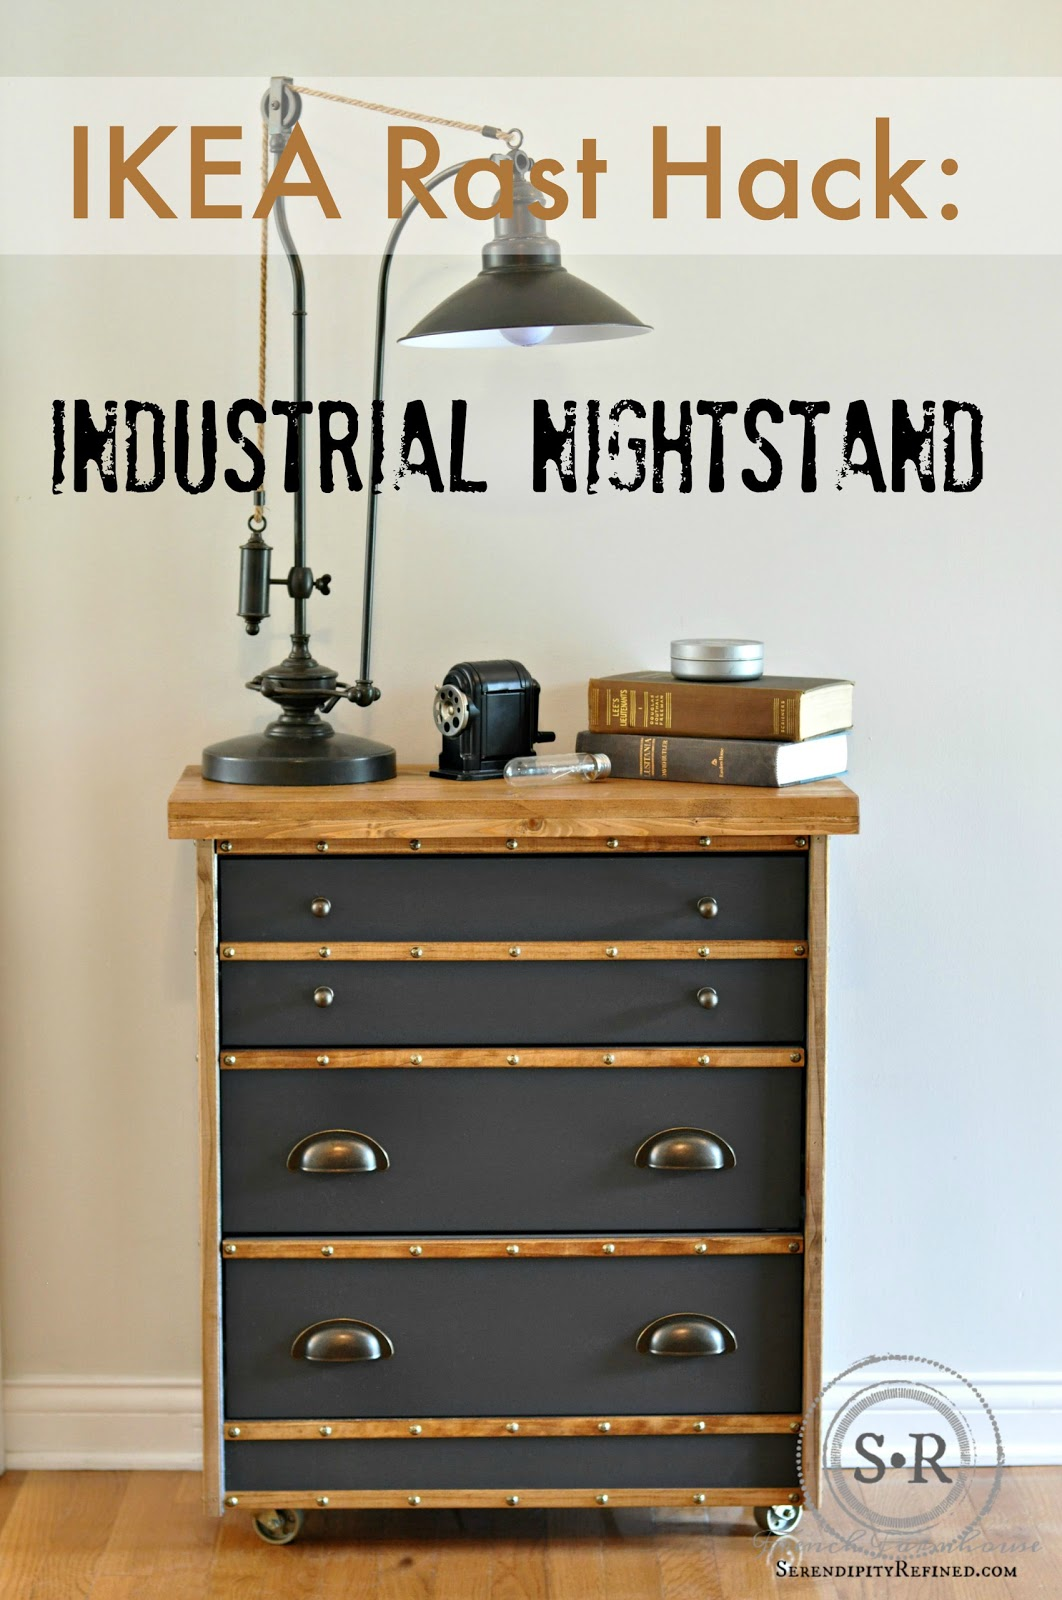 Serendipity Refined Blog IKEA Rast Hack Industrial